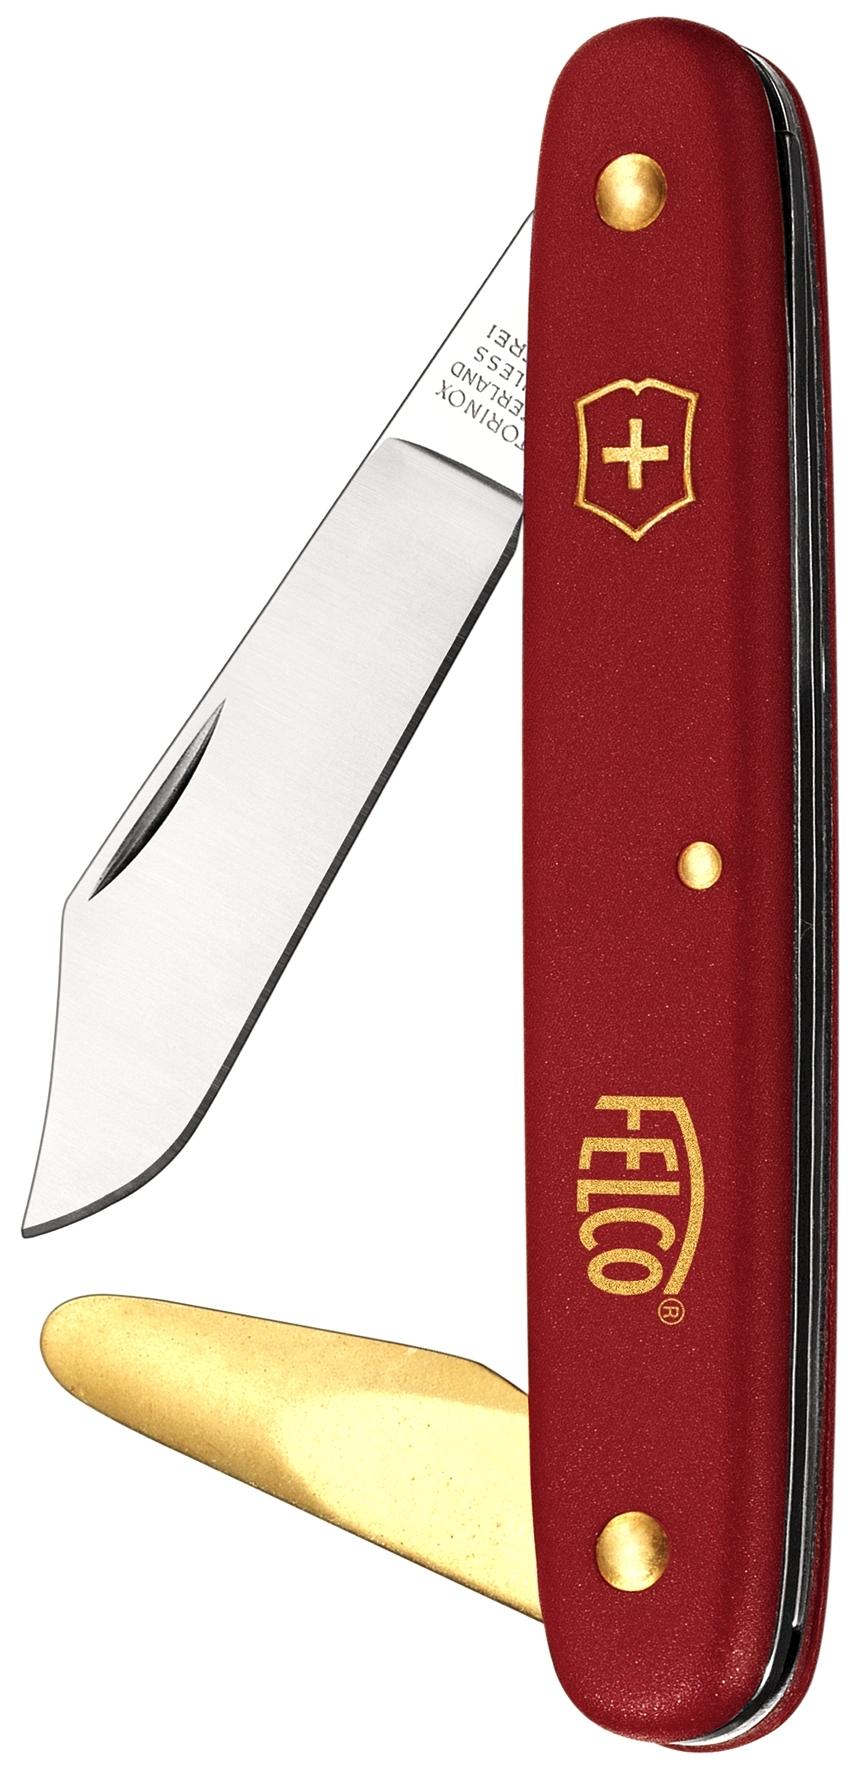 FELCO All-purpose budding knife FE-3.91-10